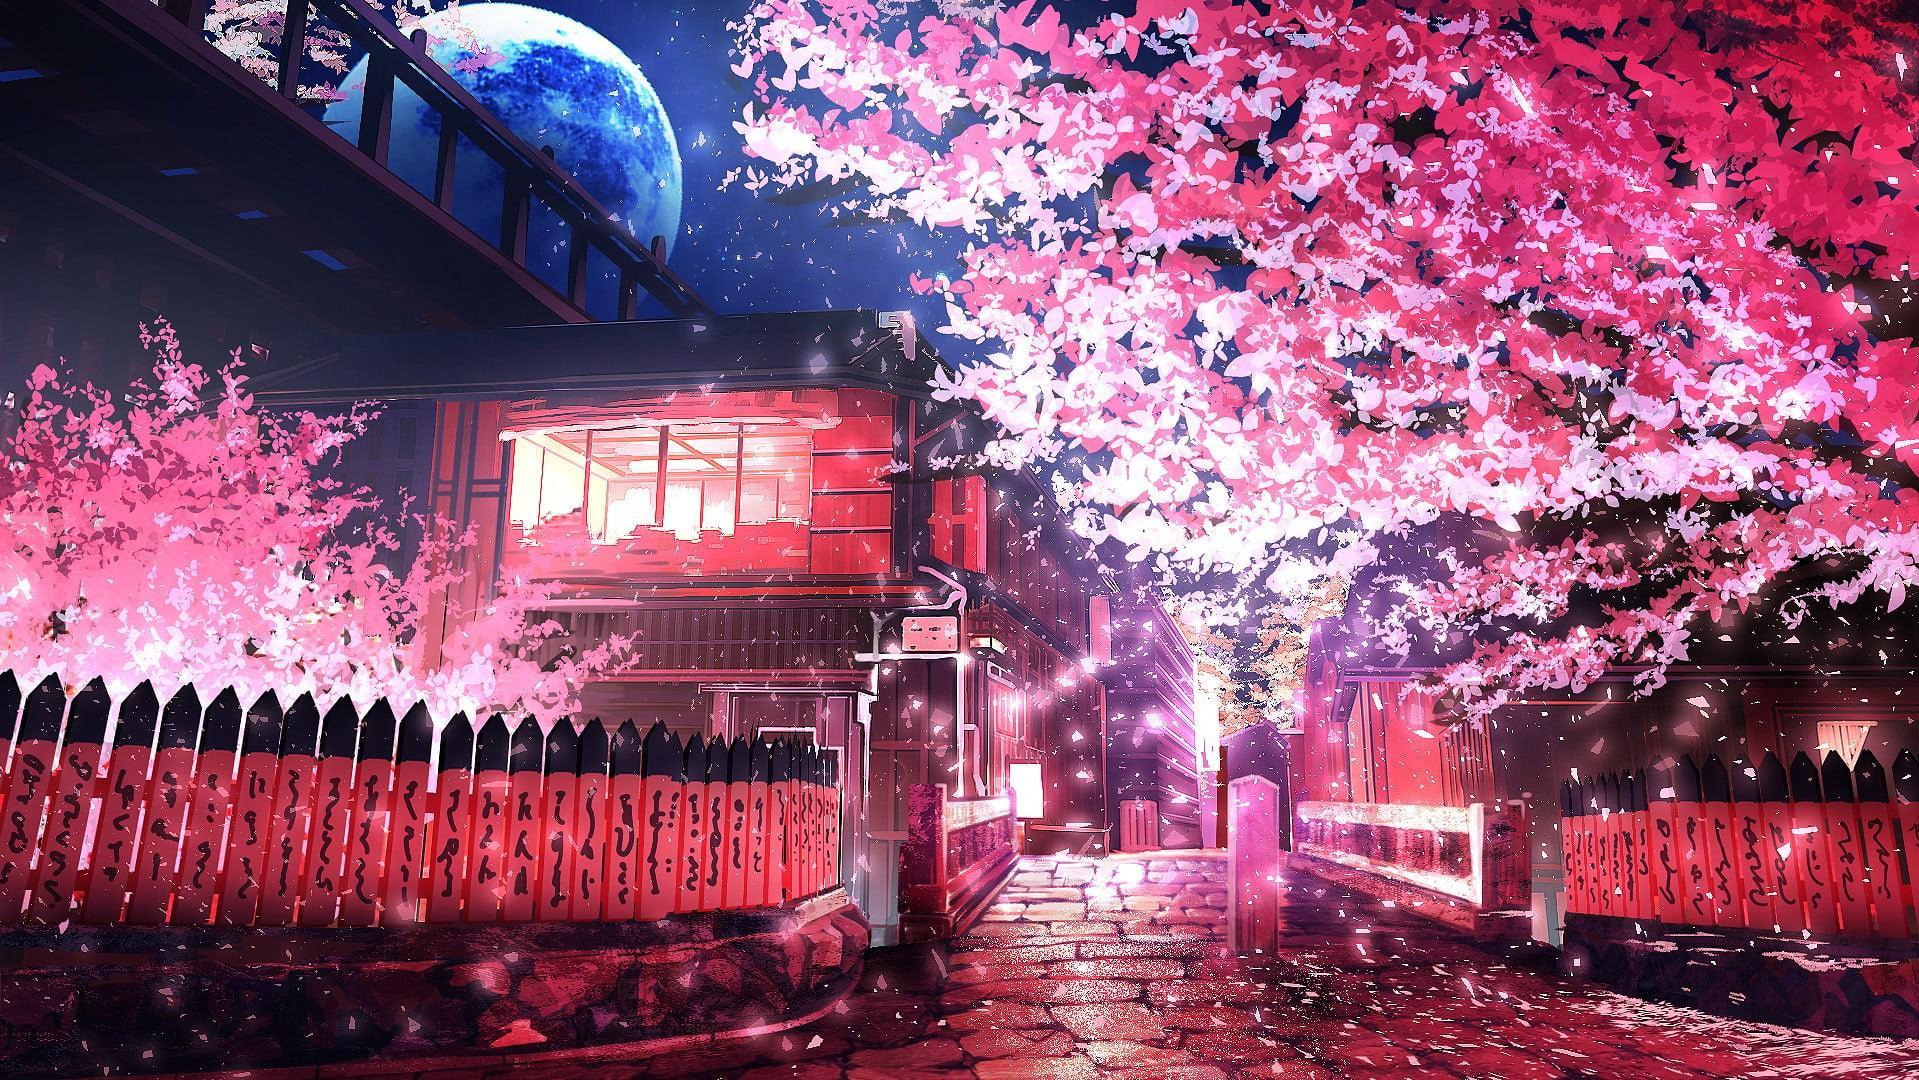 Anime Sakura Trees Hd Wallpapers Wallpaper Cave